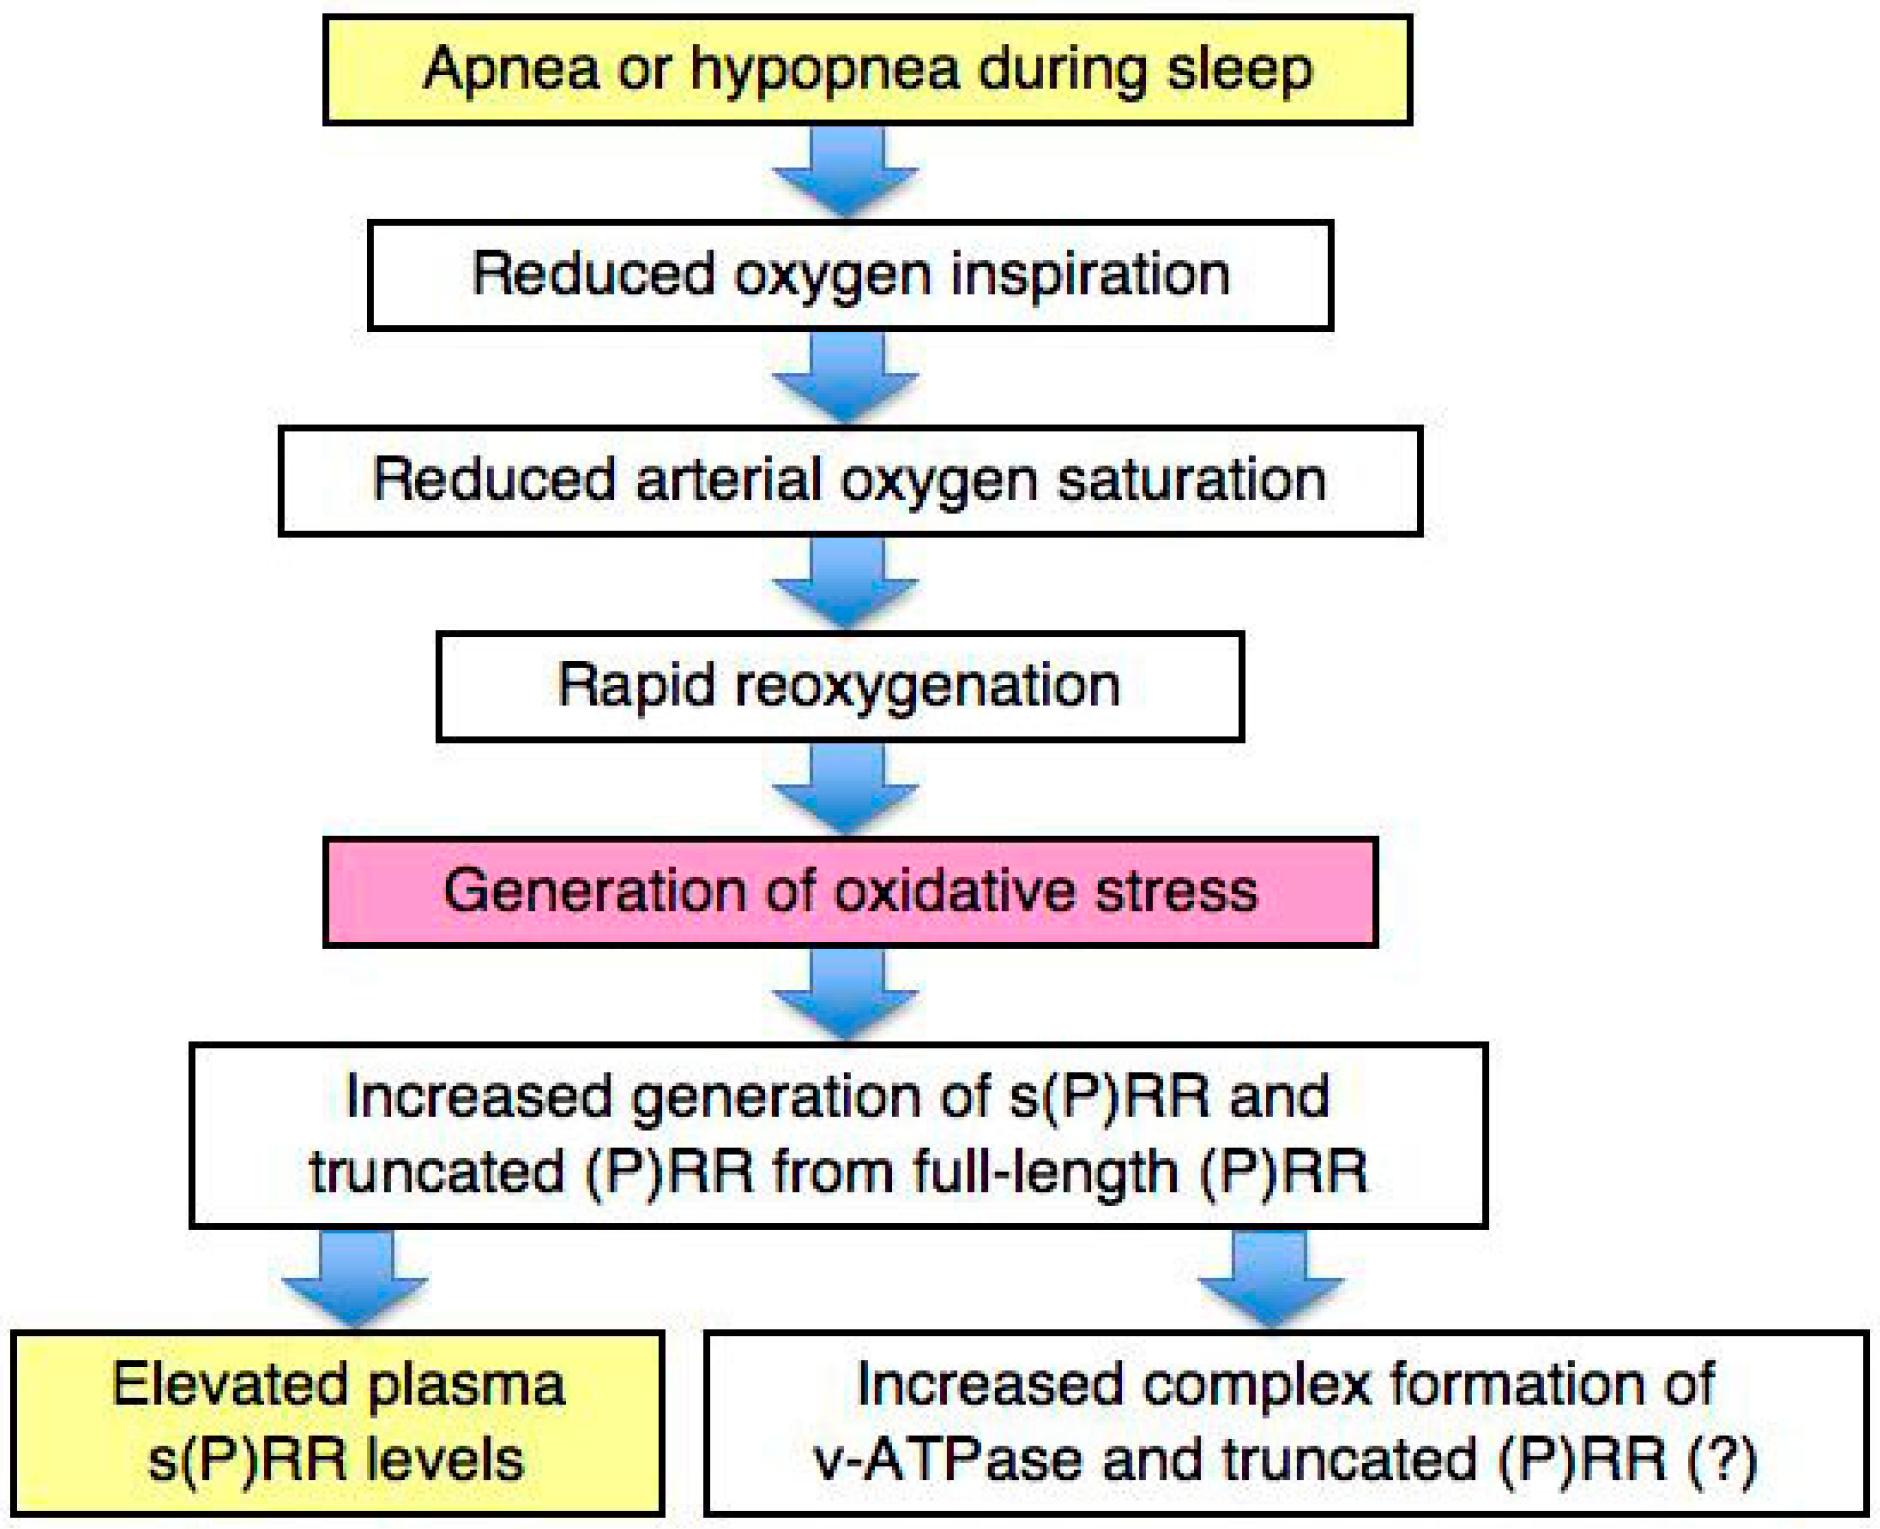 OBSTRUCTIVE SLEEP APNEA SYNDROME DOWNLOAD